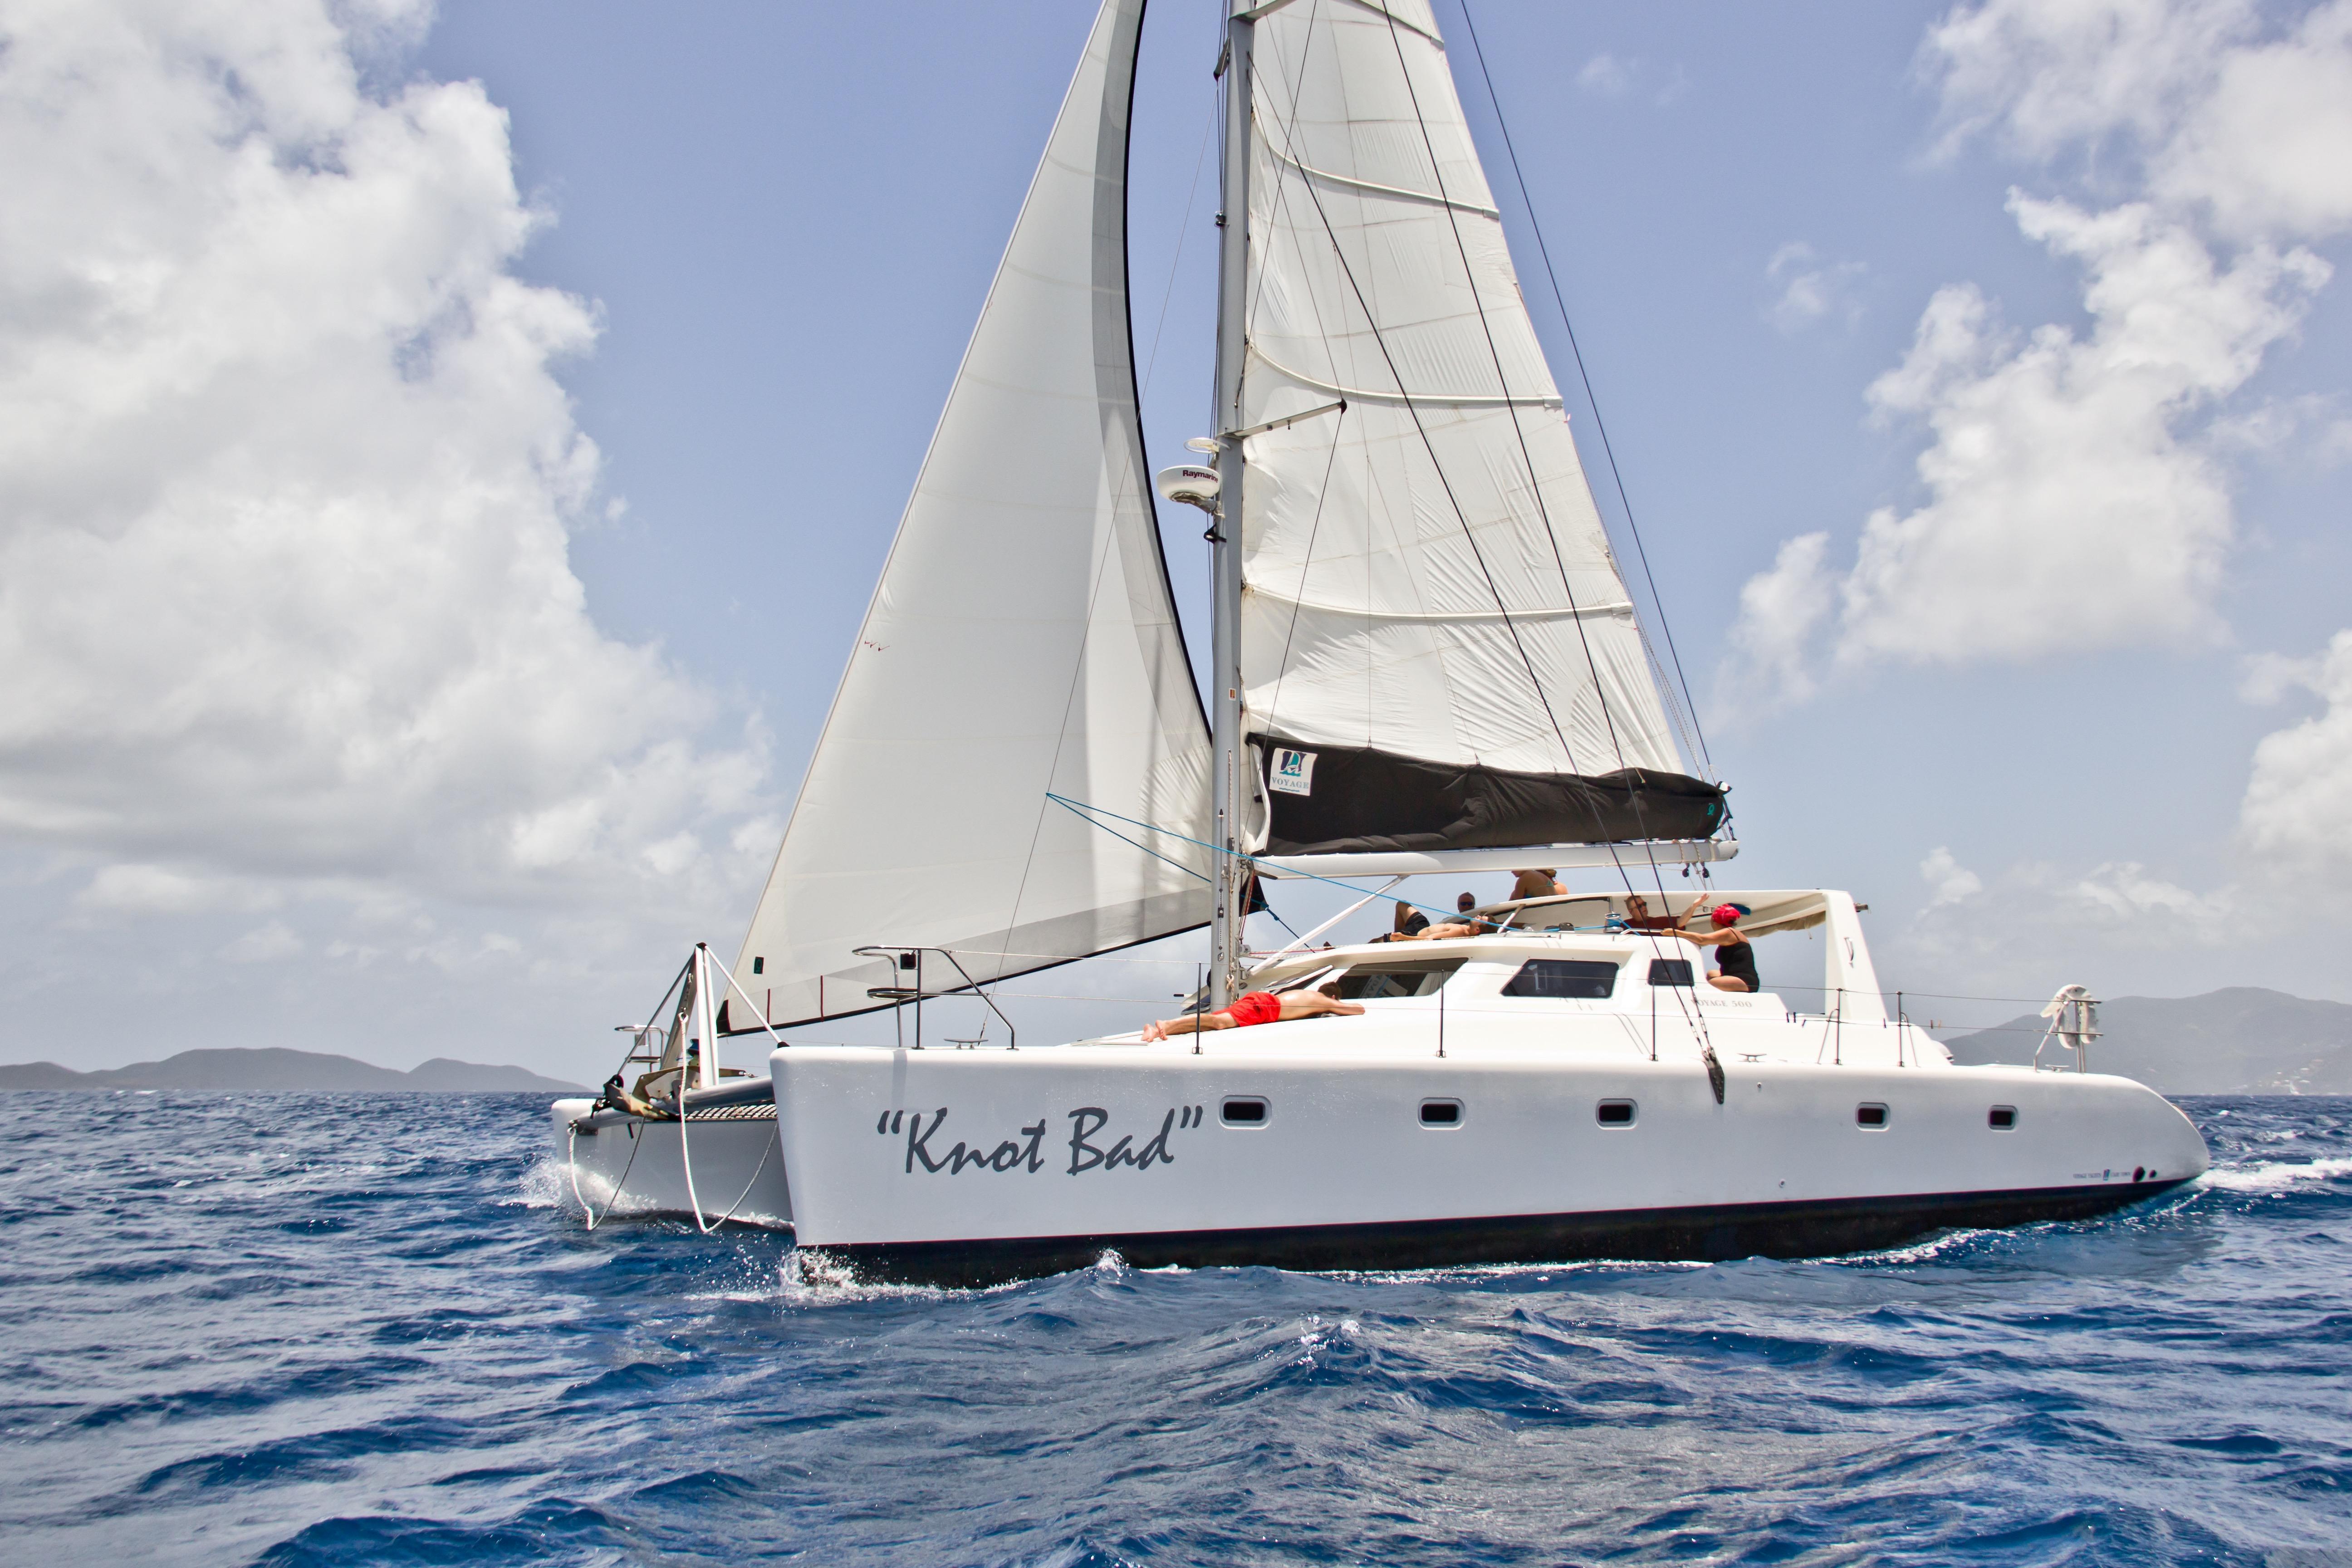 Images of Catamaran Sailing Yachts - #rock-cafe